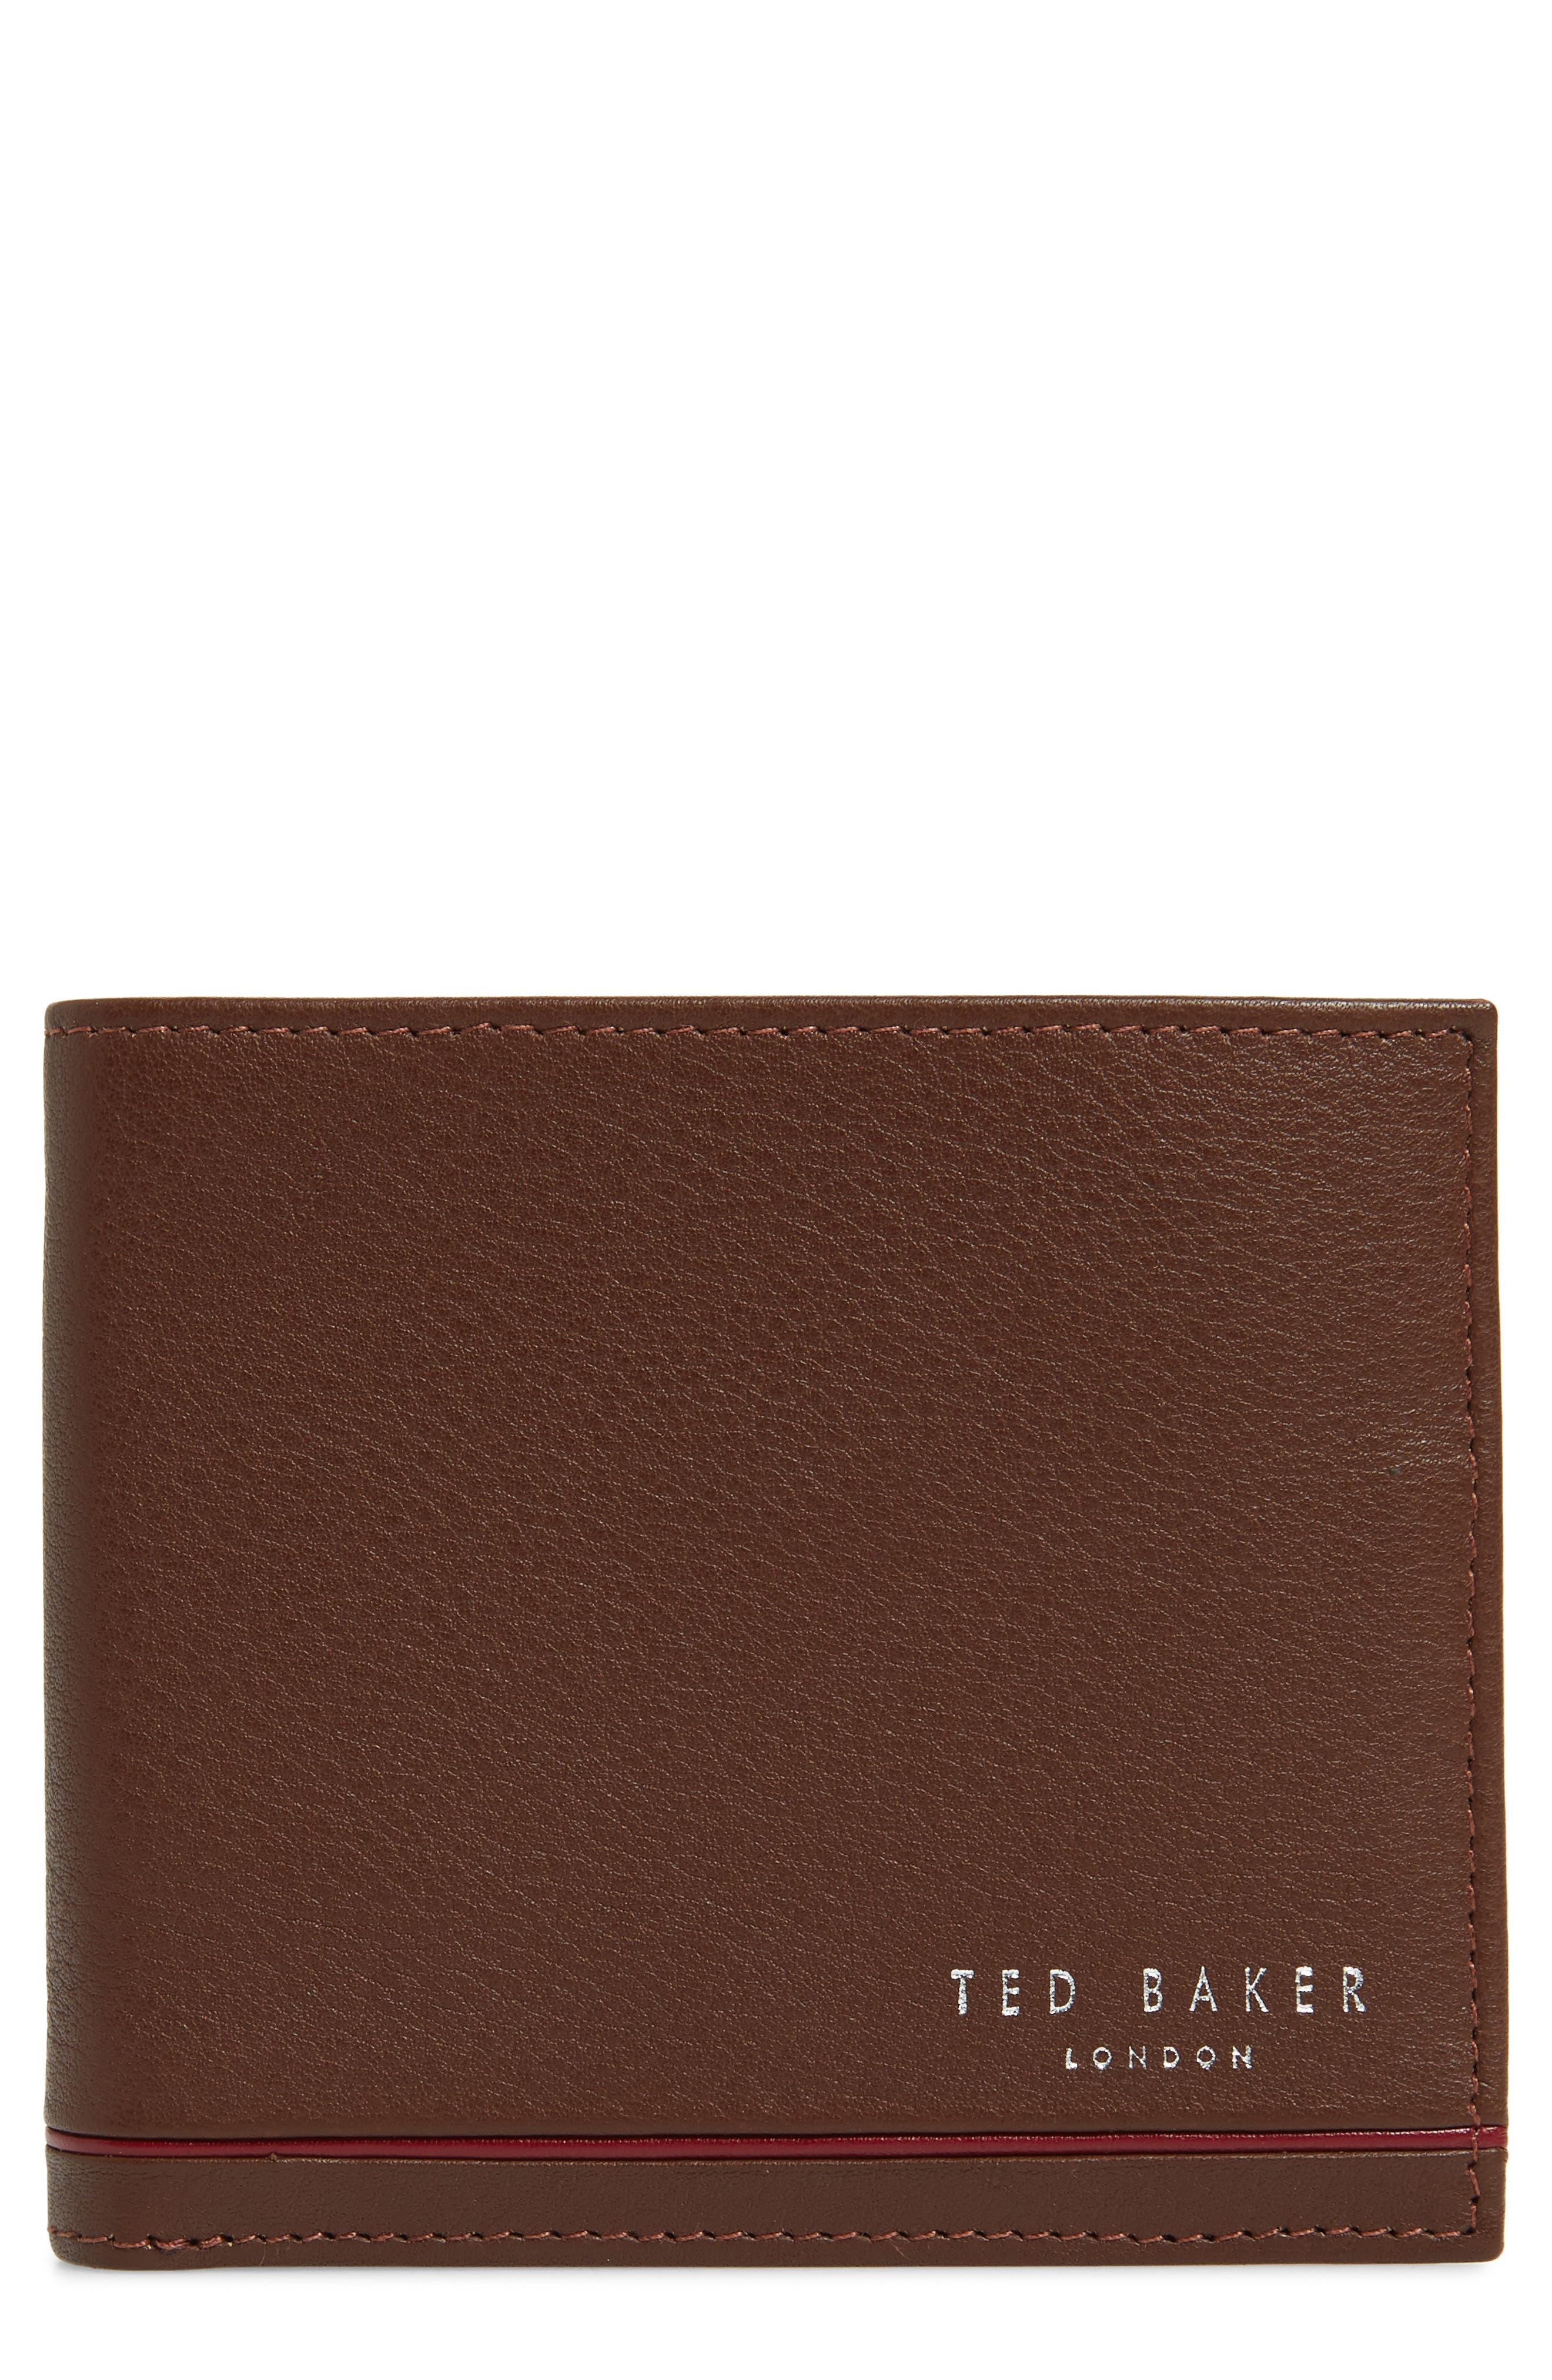 Dooree Leather Wallet,                         Main,                         color, 217